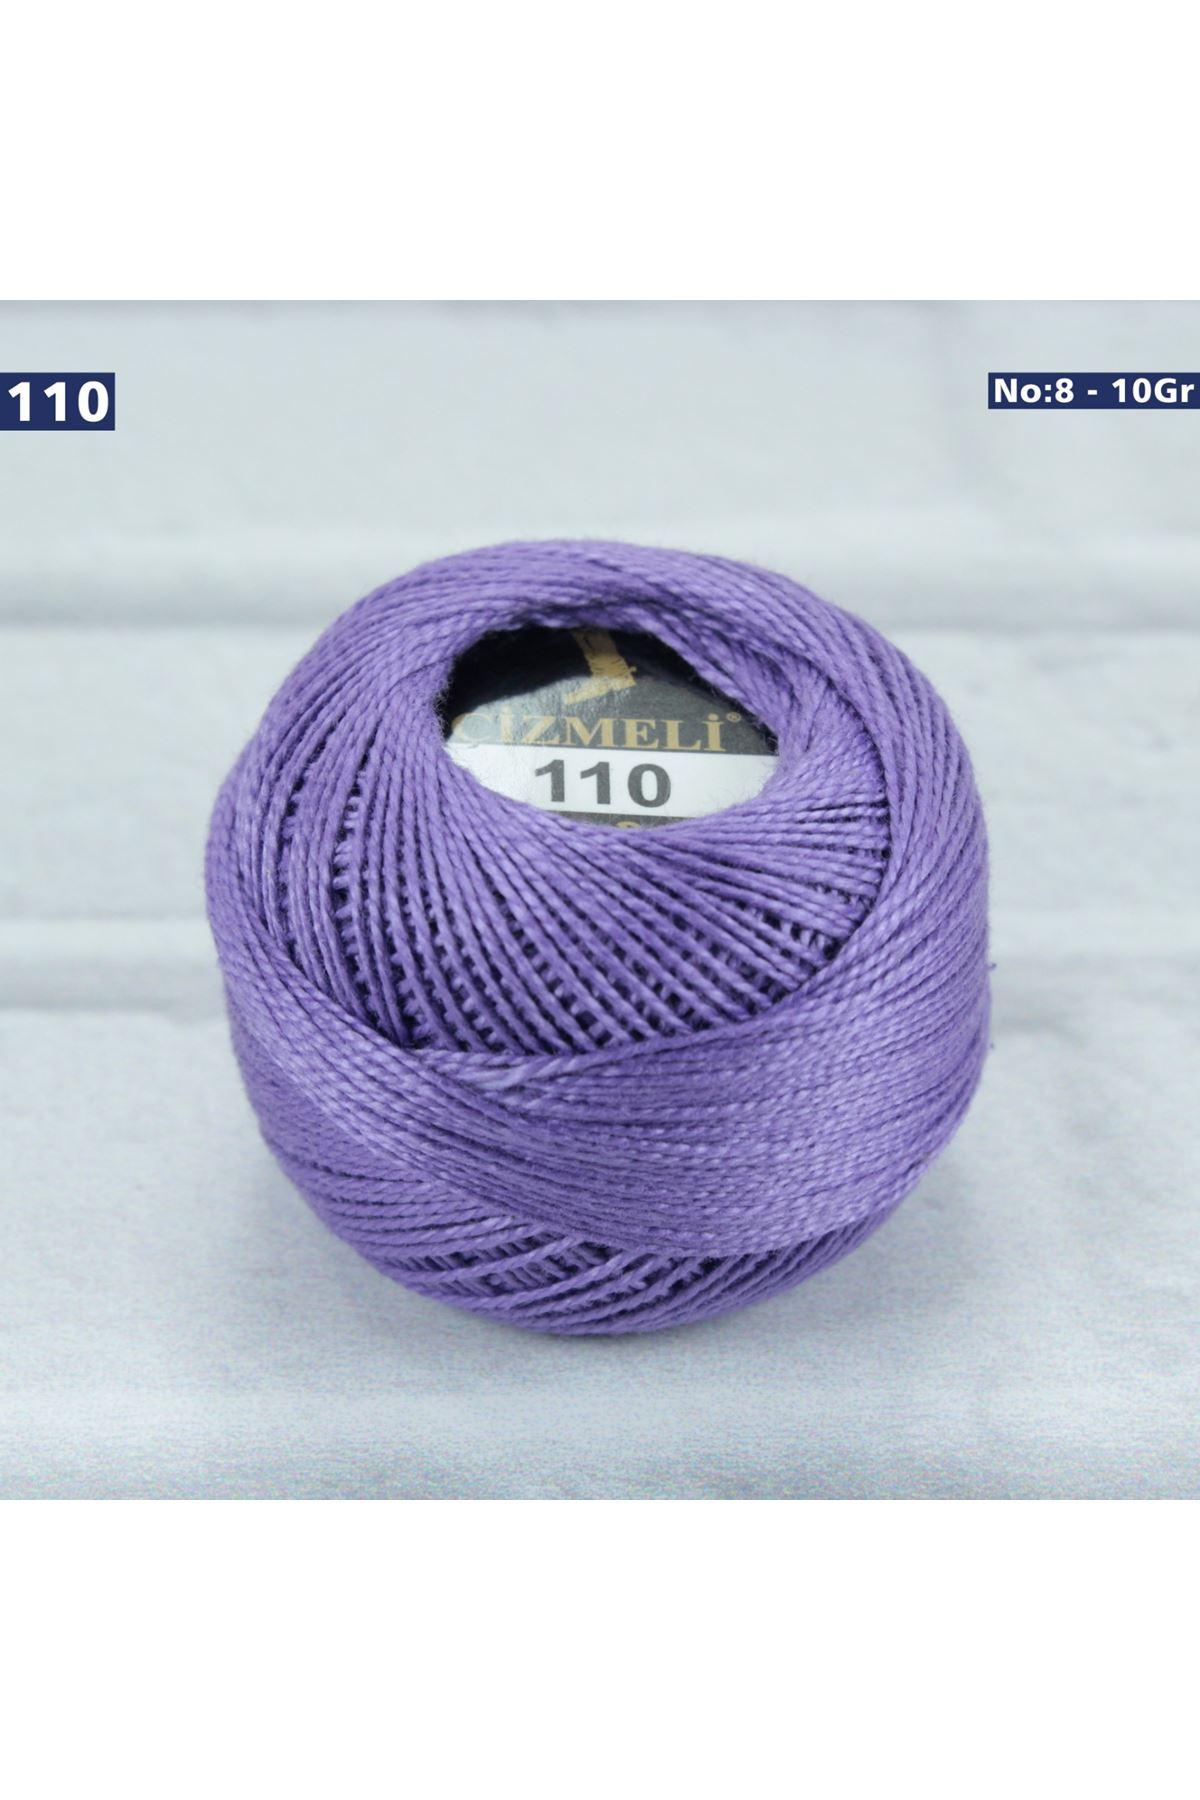 Çizmeli Cotton Perle Nakış İpliği No: 110